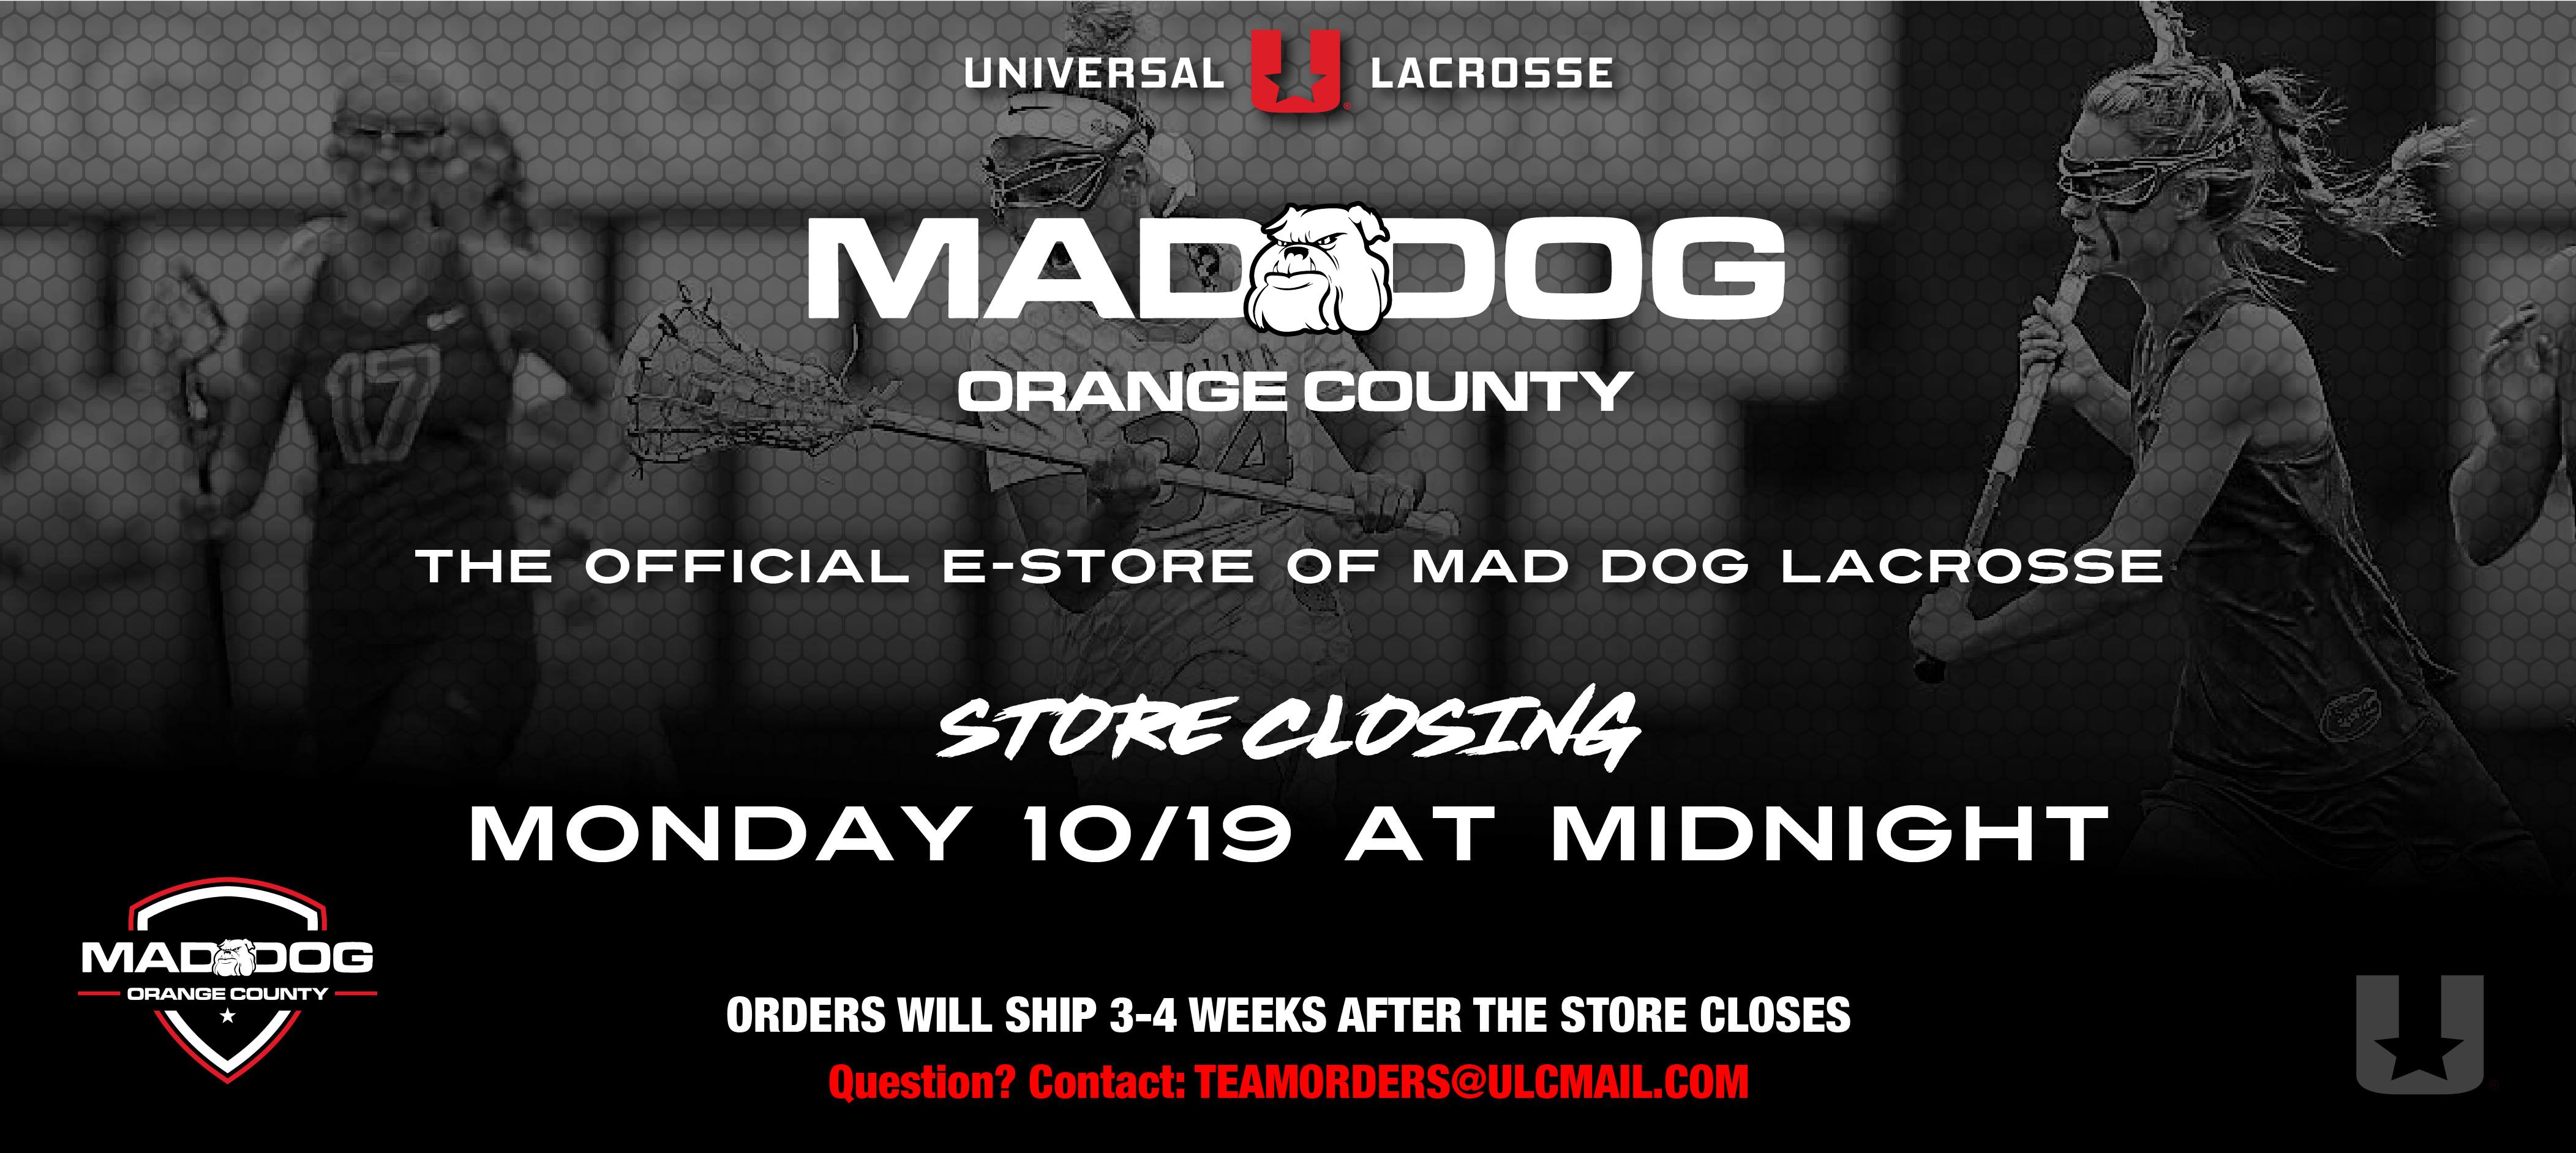 Mad Dog Orange County